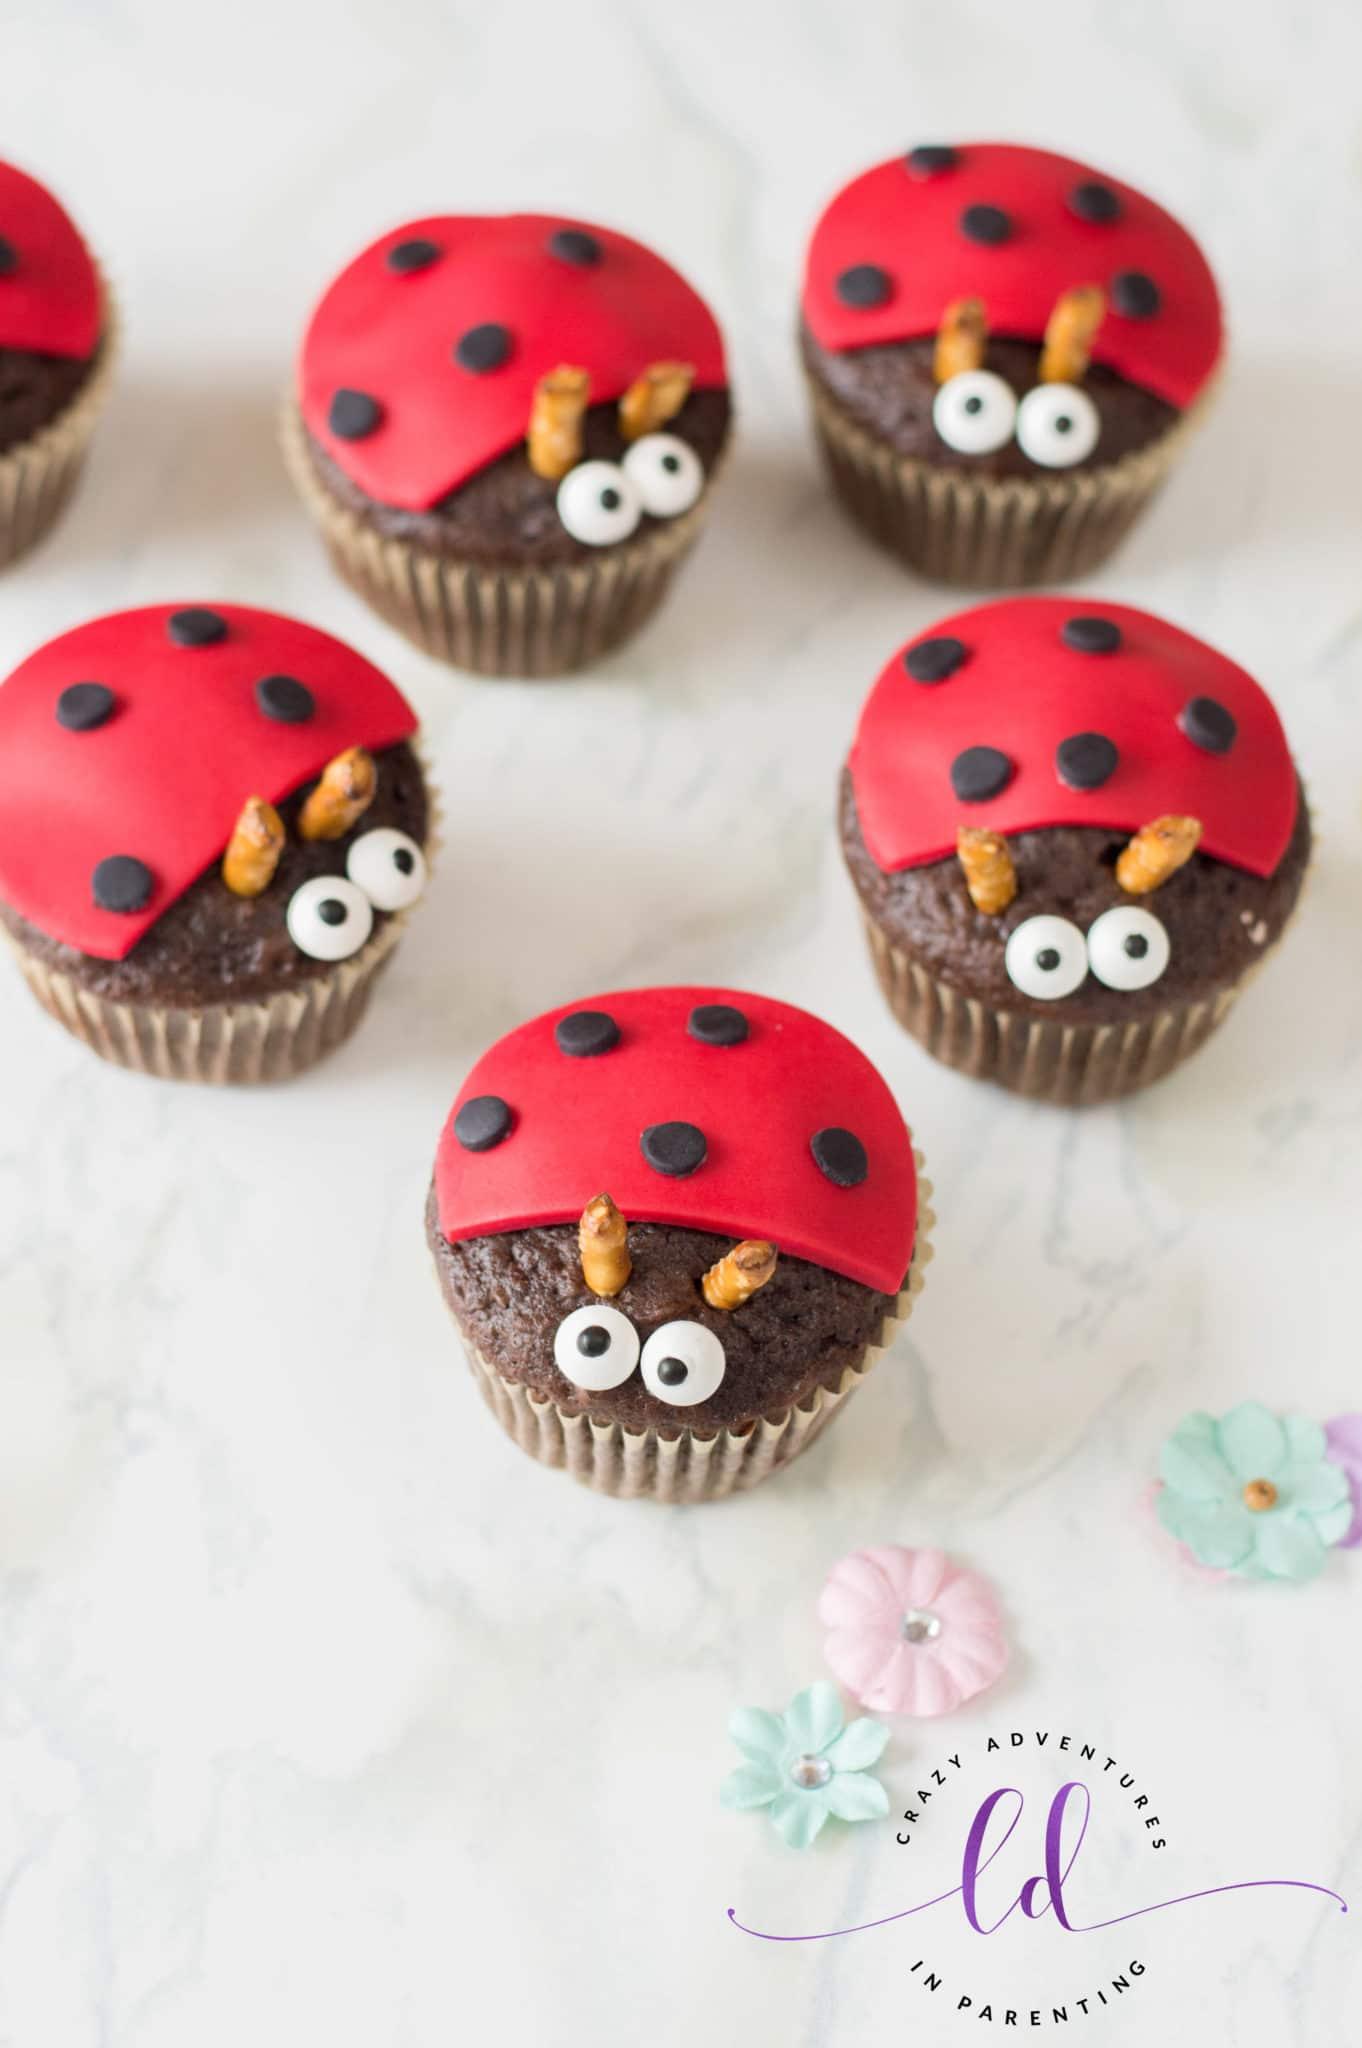 Ladybug Lovebug Cupcakes for Valentine's Day